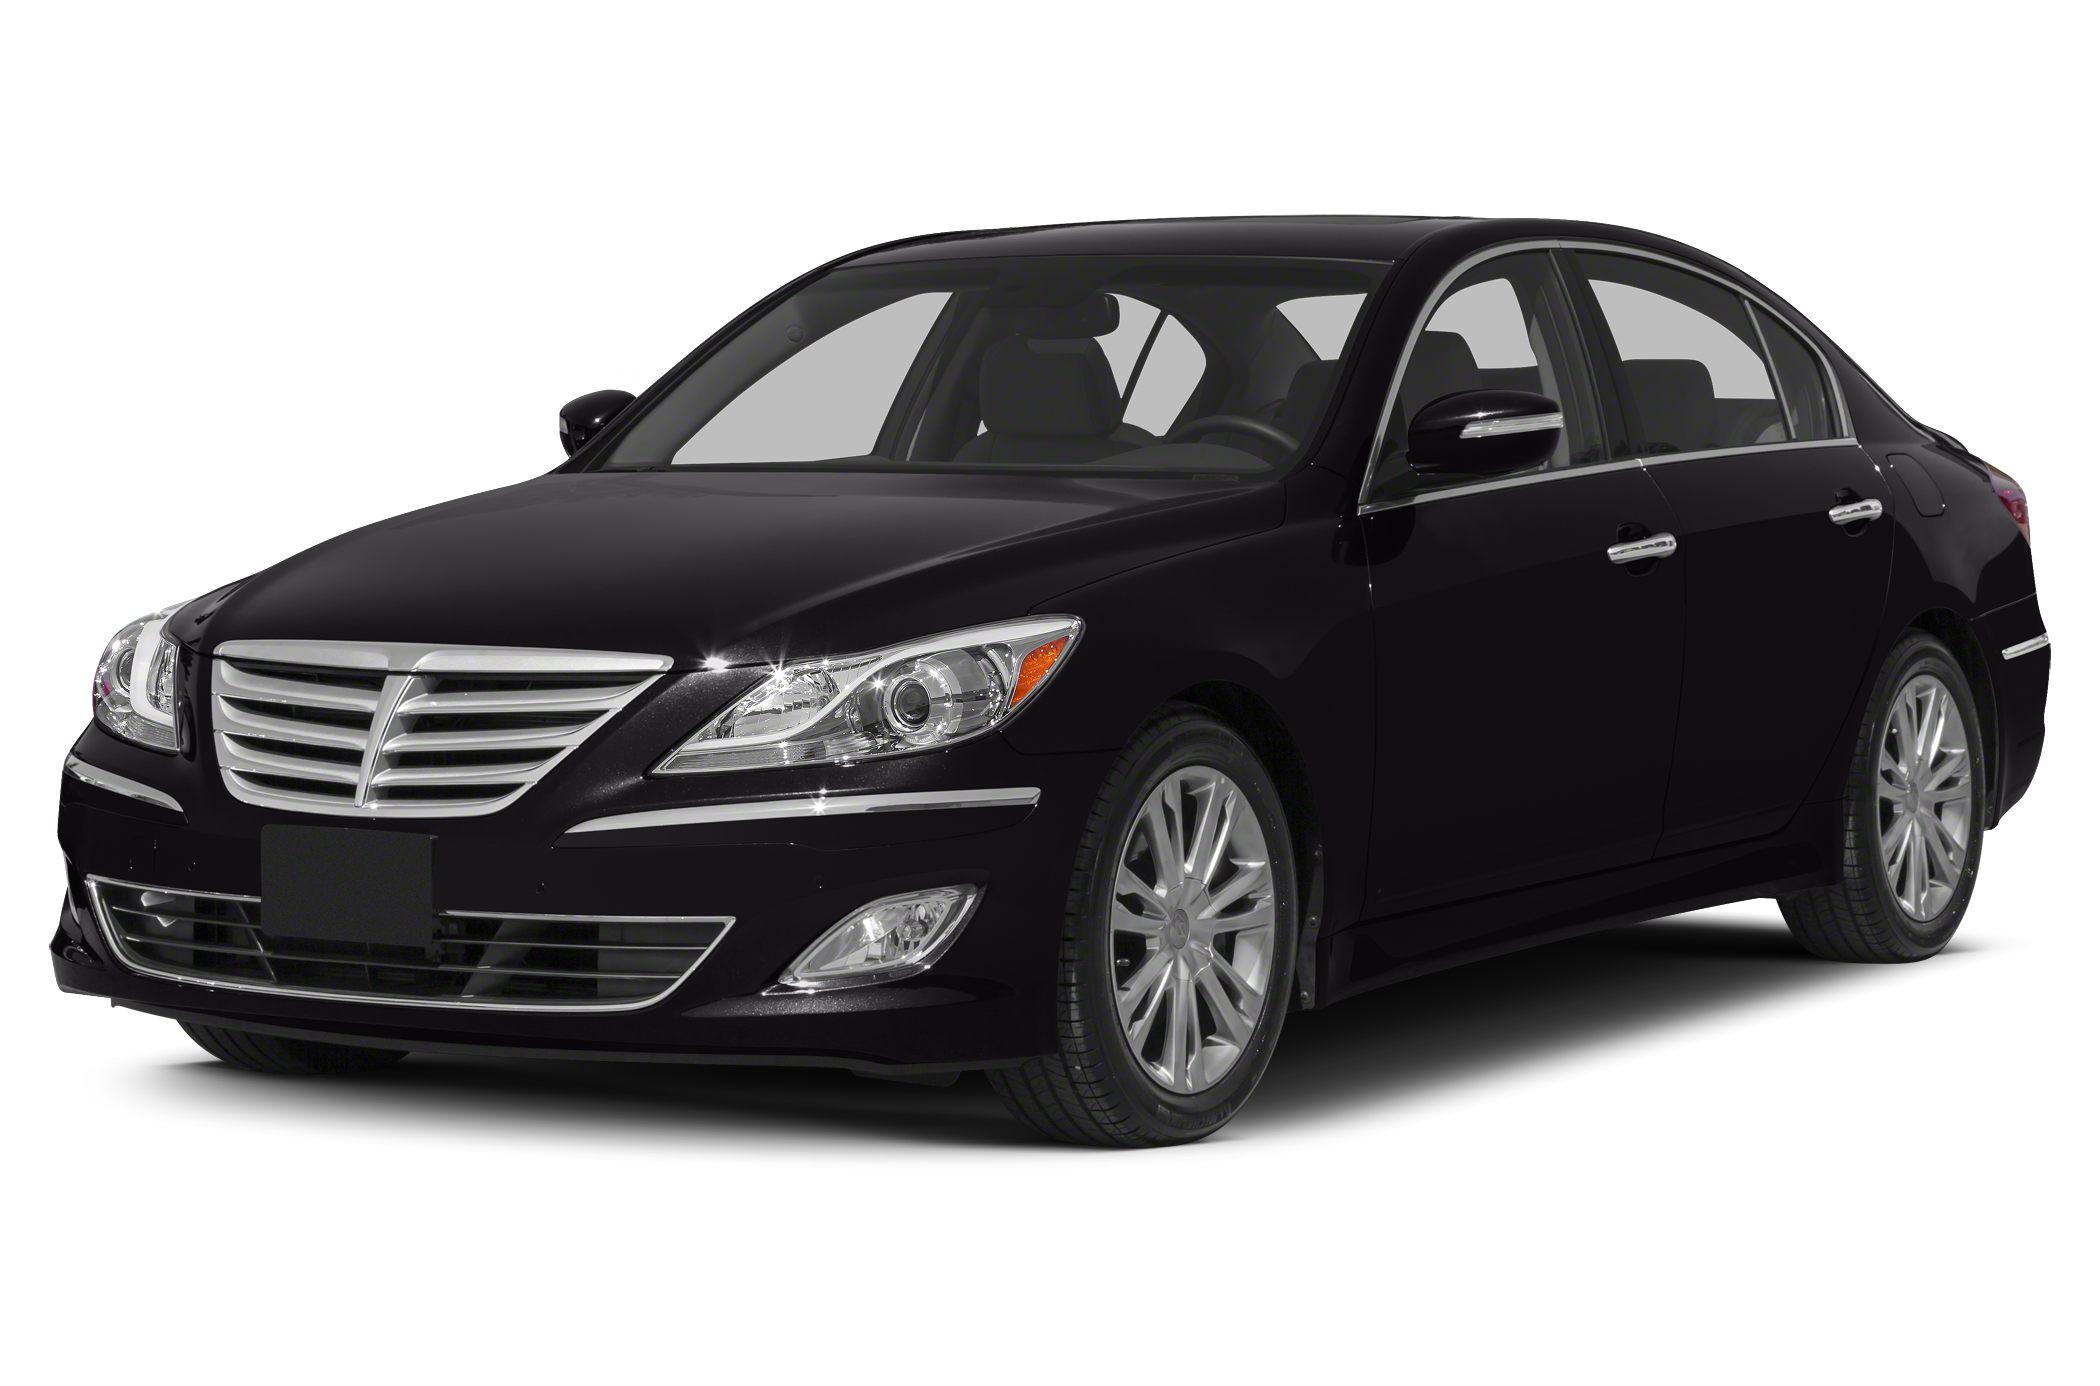 2014 Hyundai Genesis Sedan Specs Safety Rating Amp Mpg